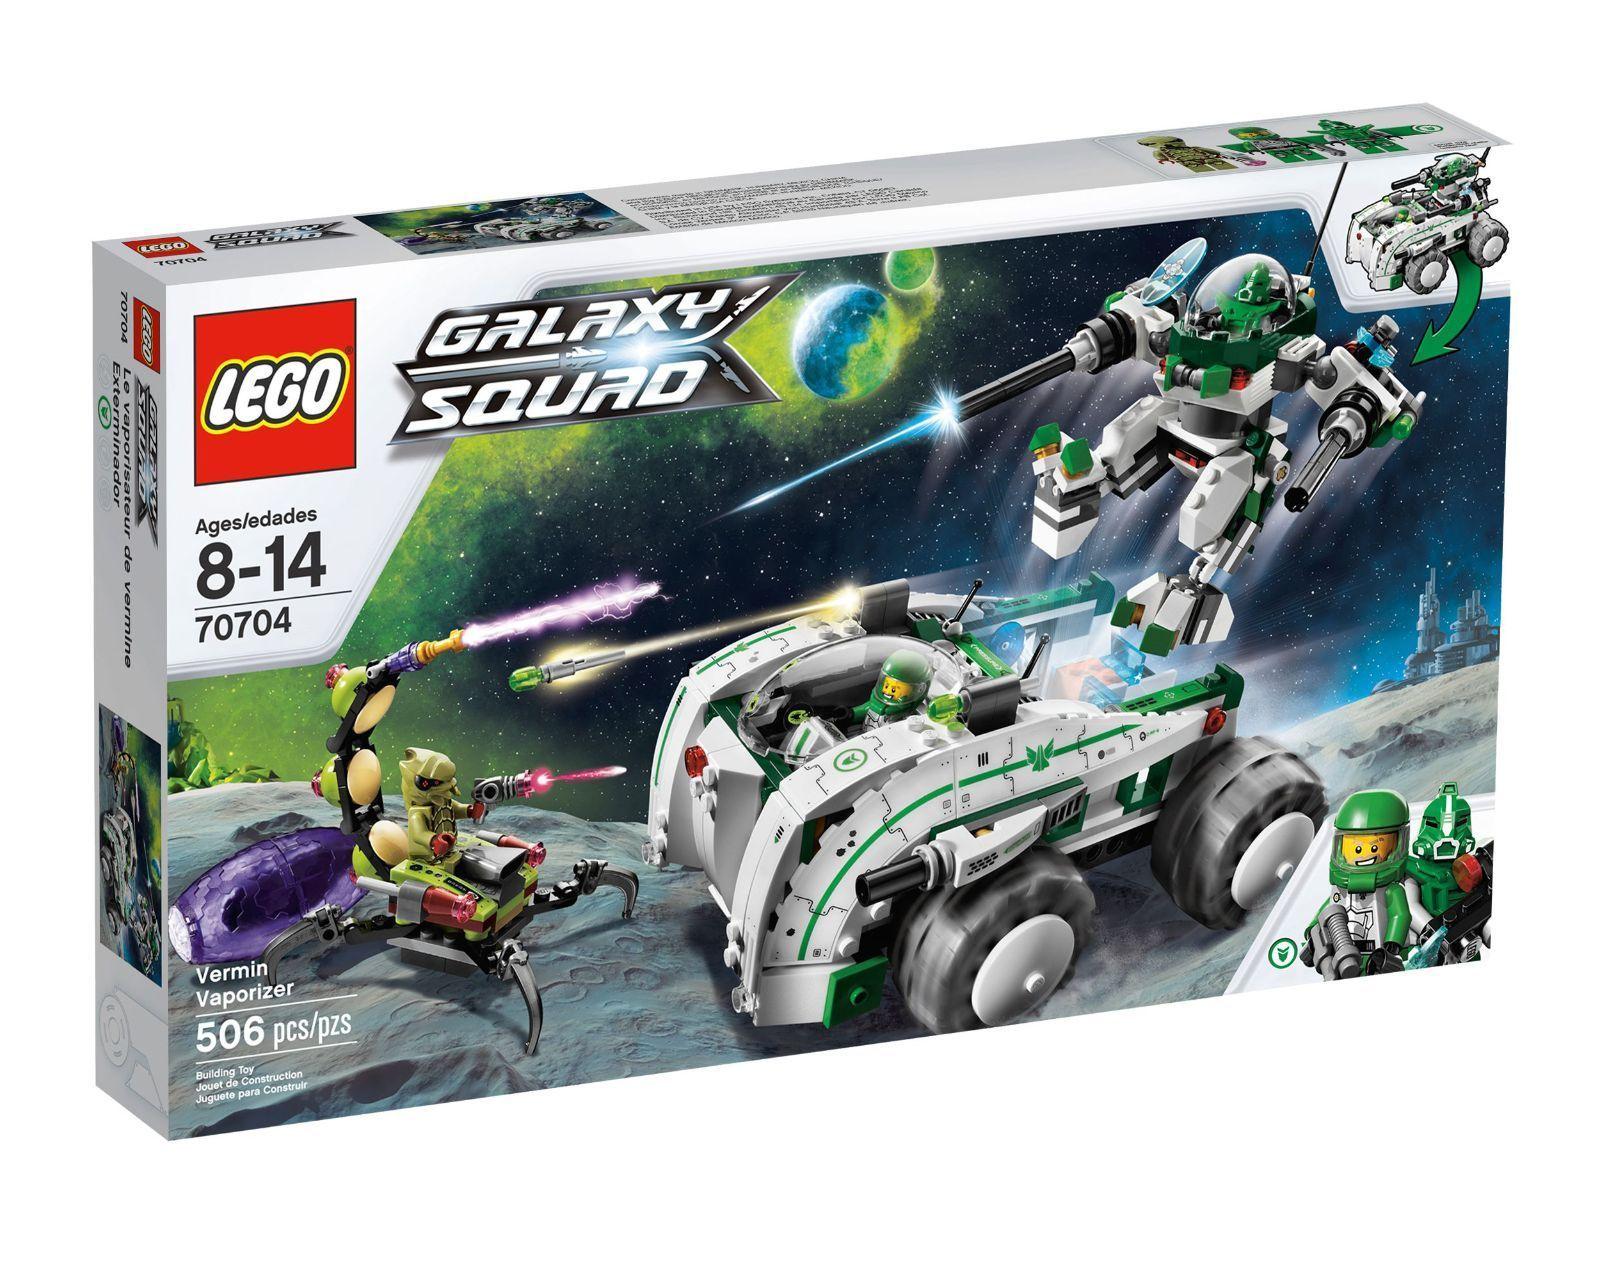 LEGO Galaxy Squad 70704 Vermin Vaporizer [New] Building Set Retired